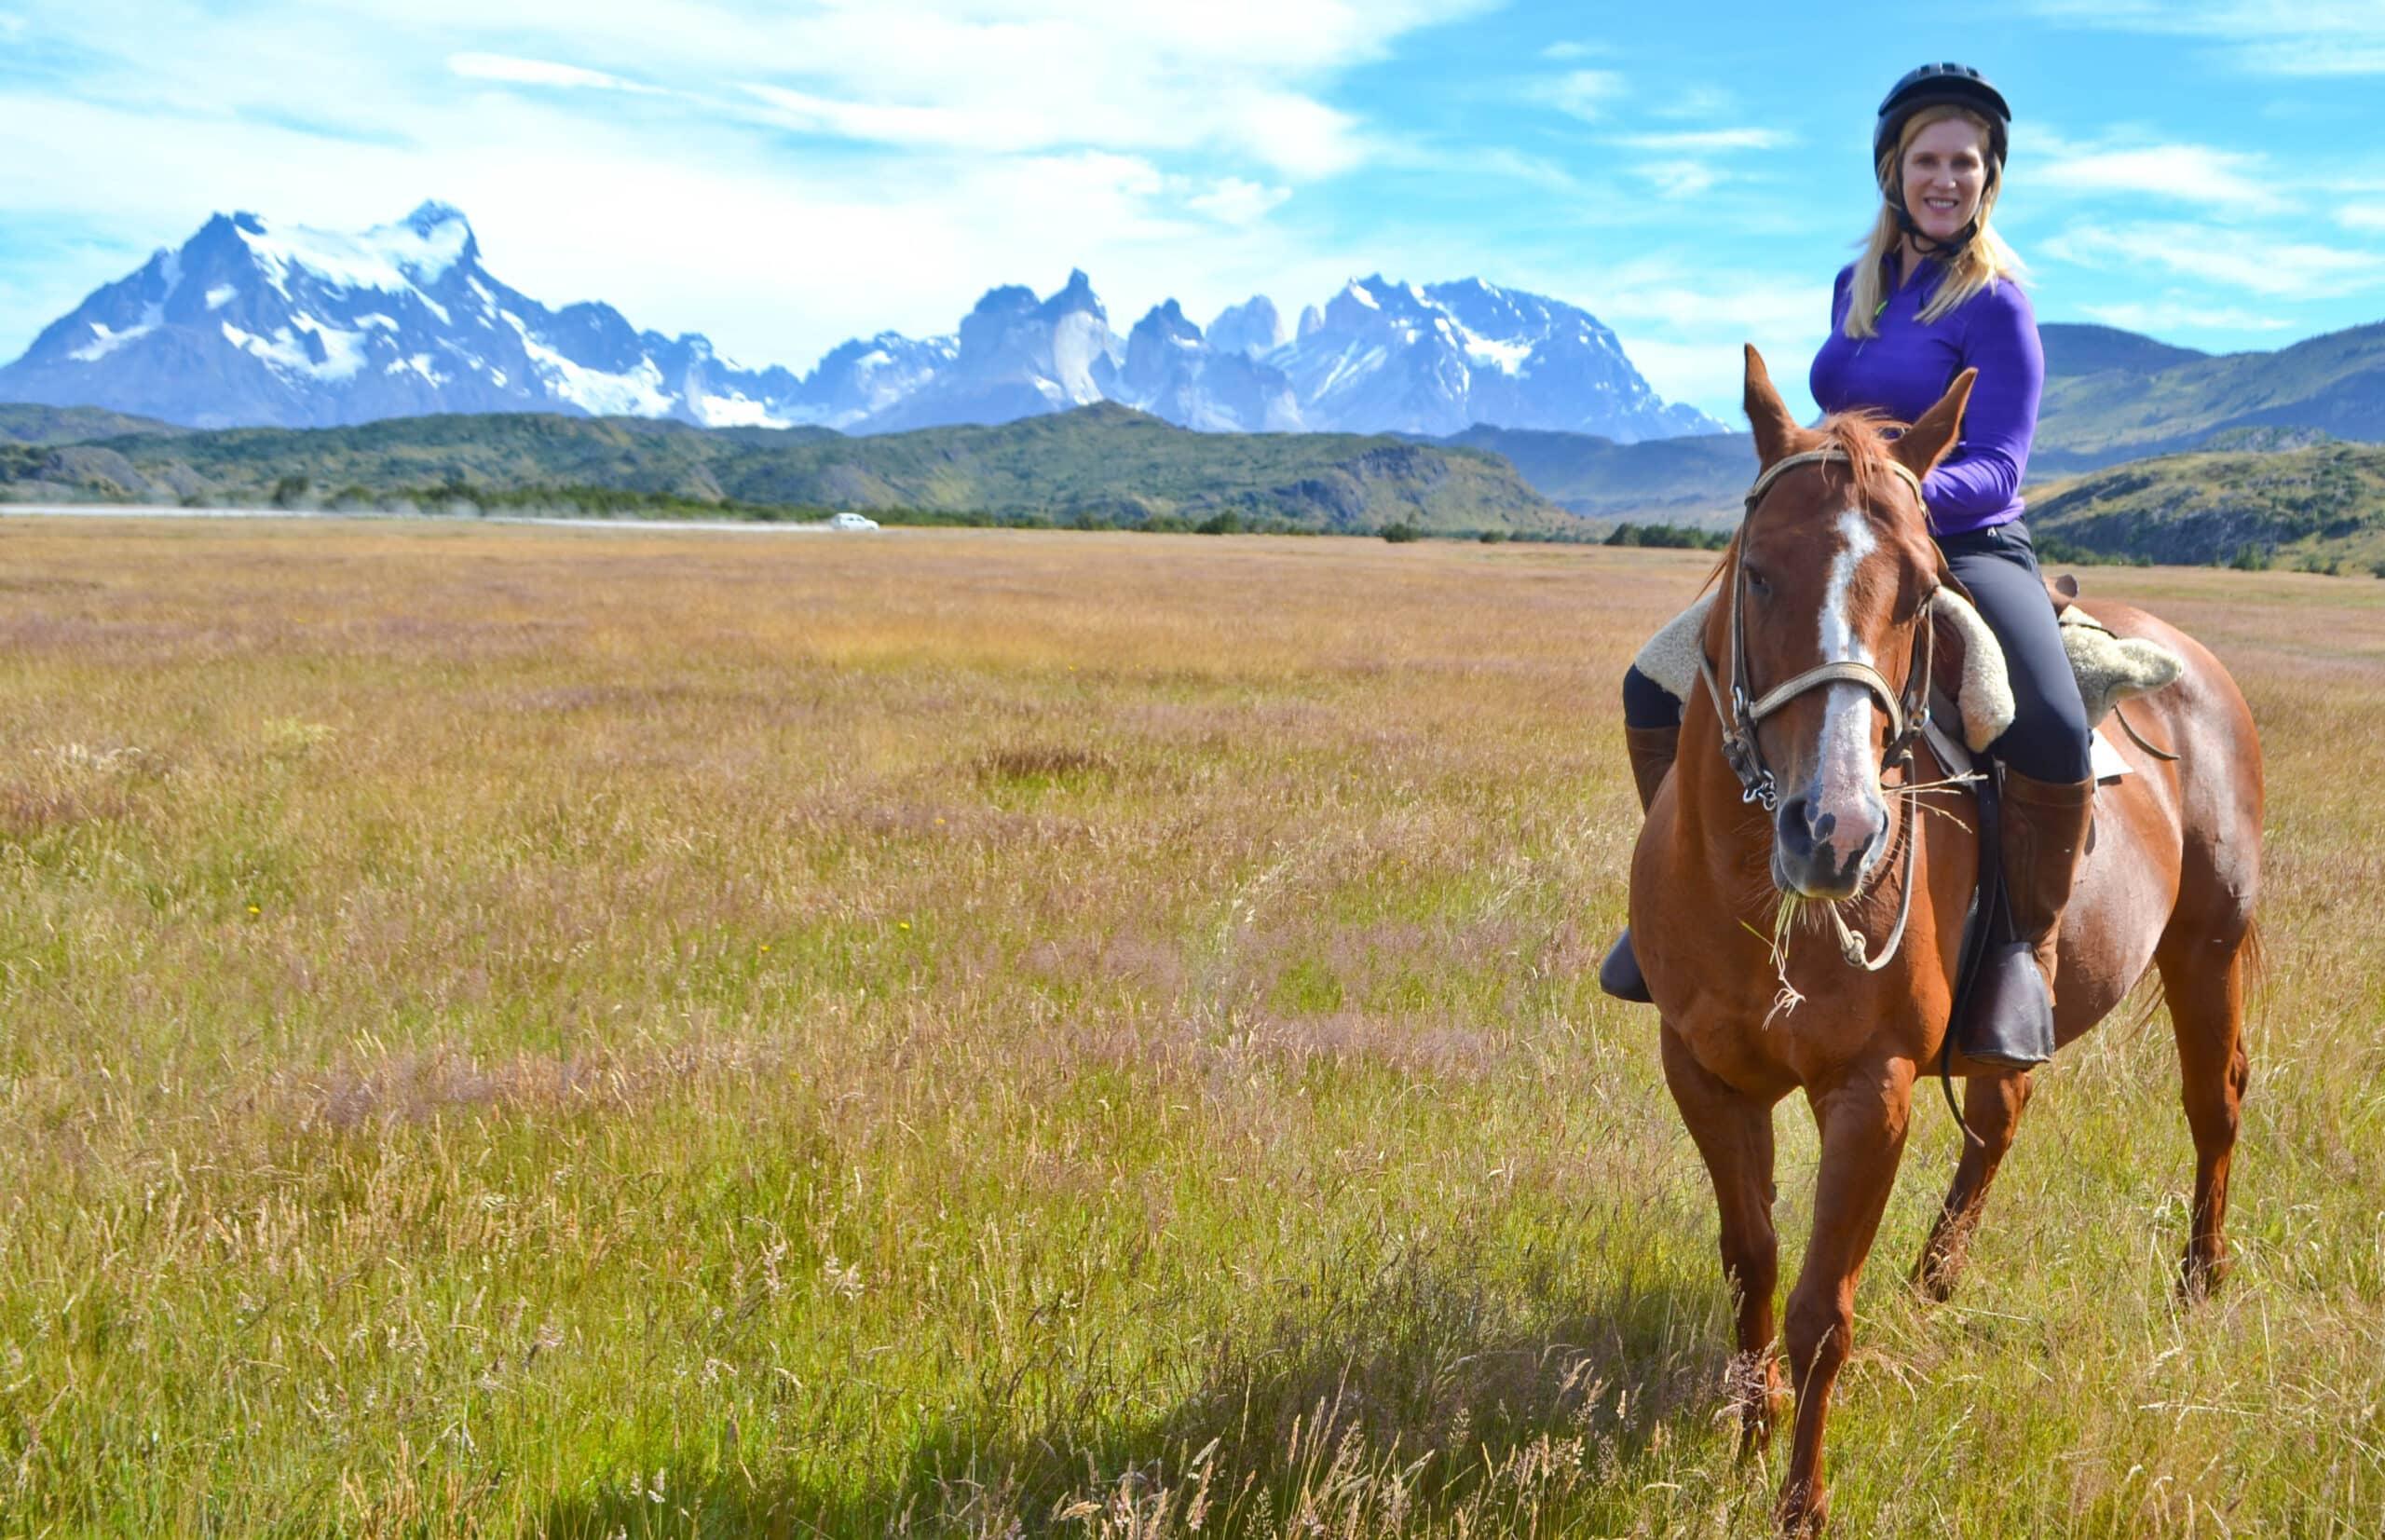 Horseback riding Torres del Paine Patagonia Chile